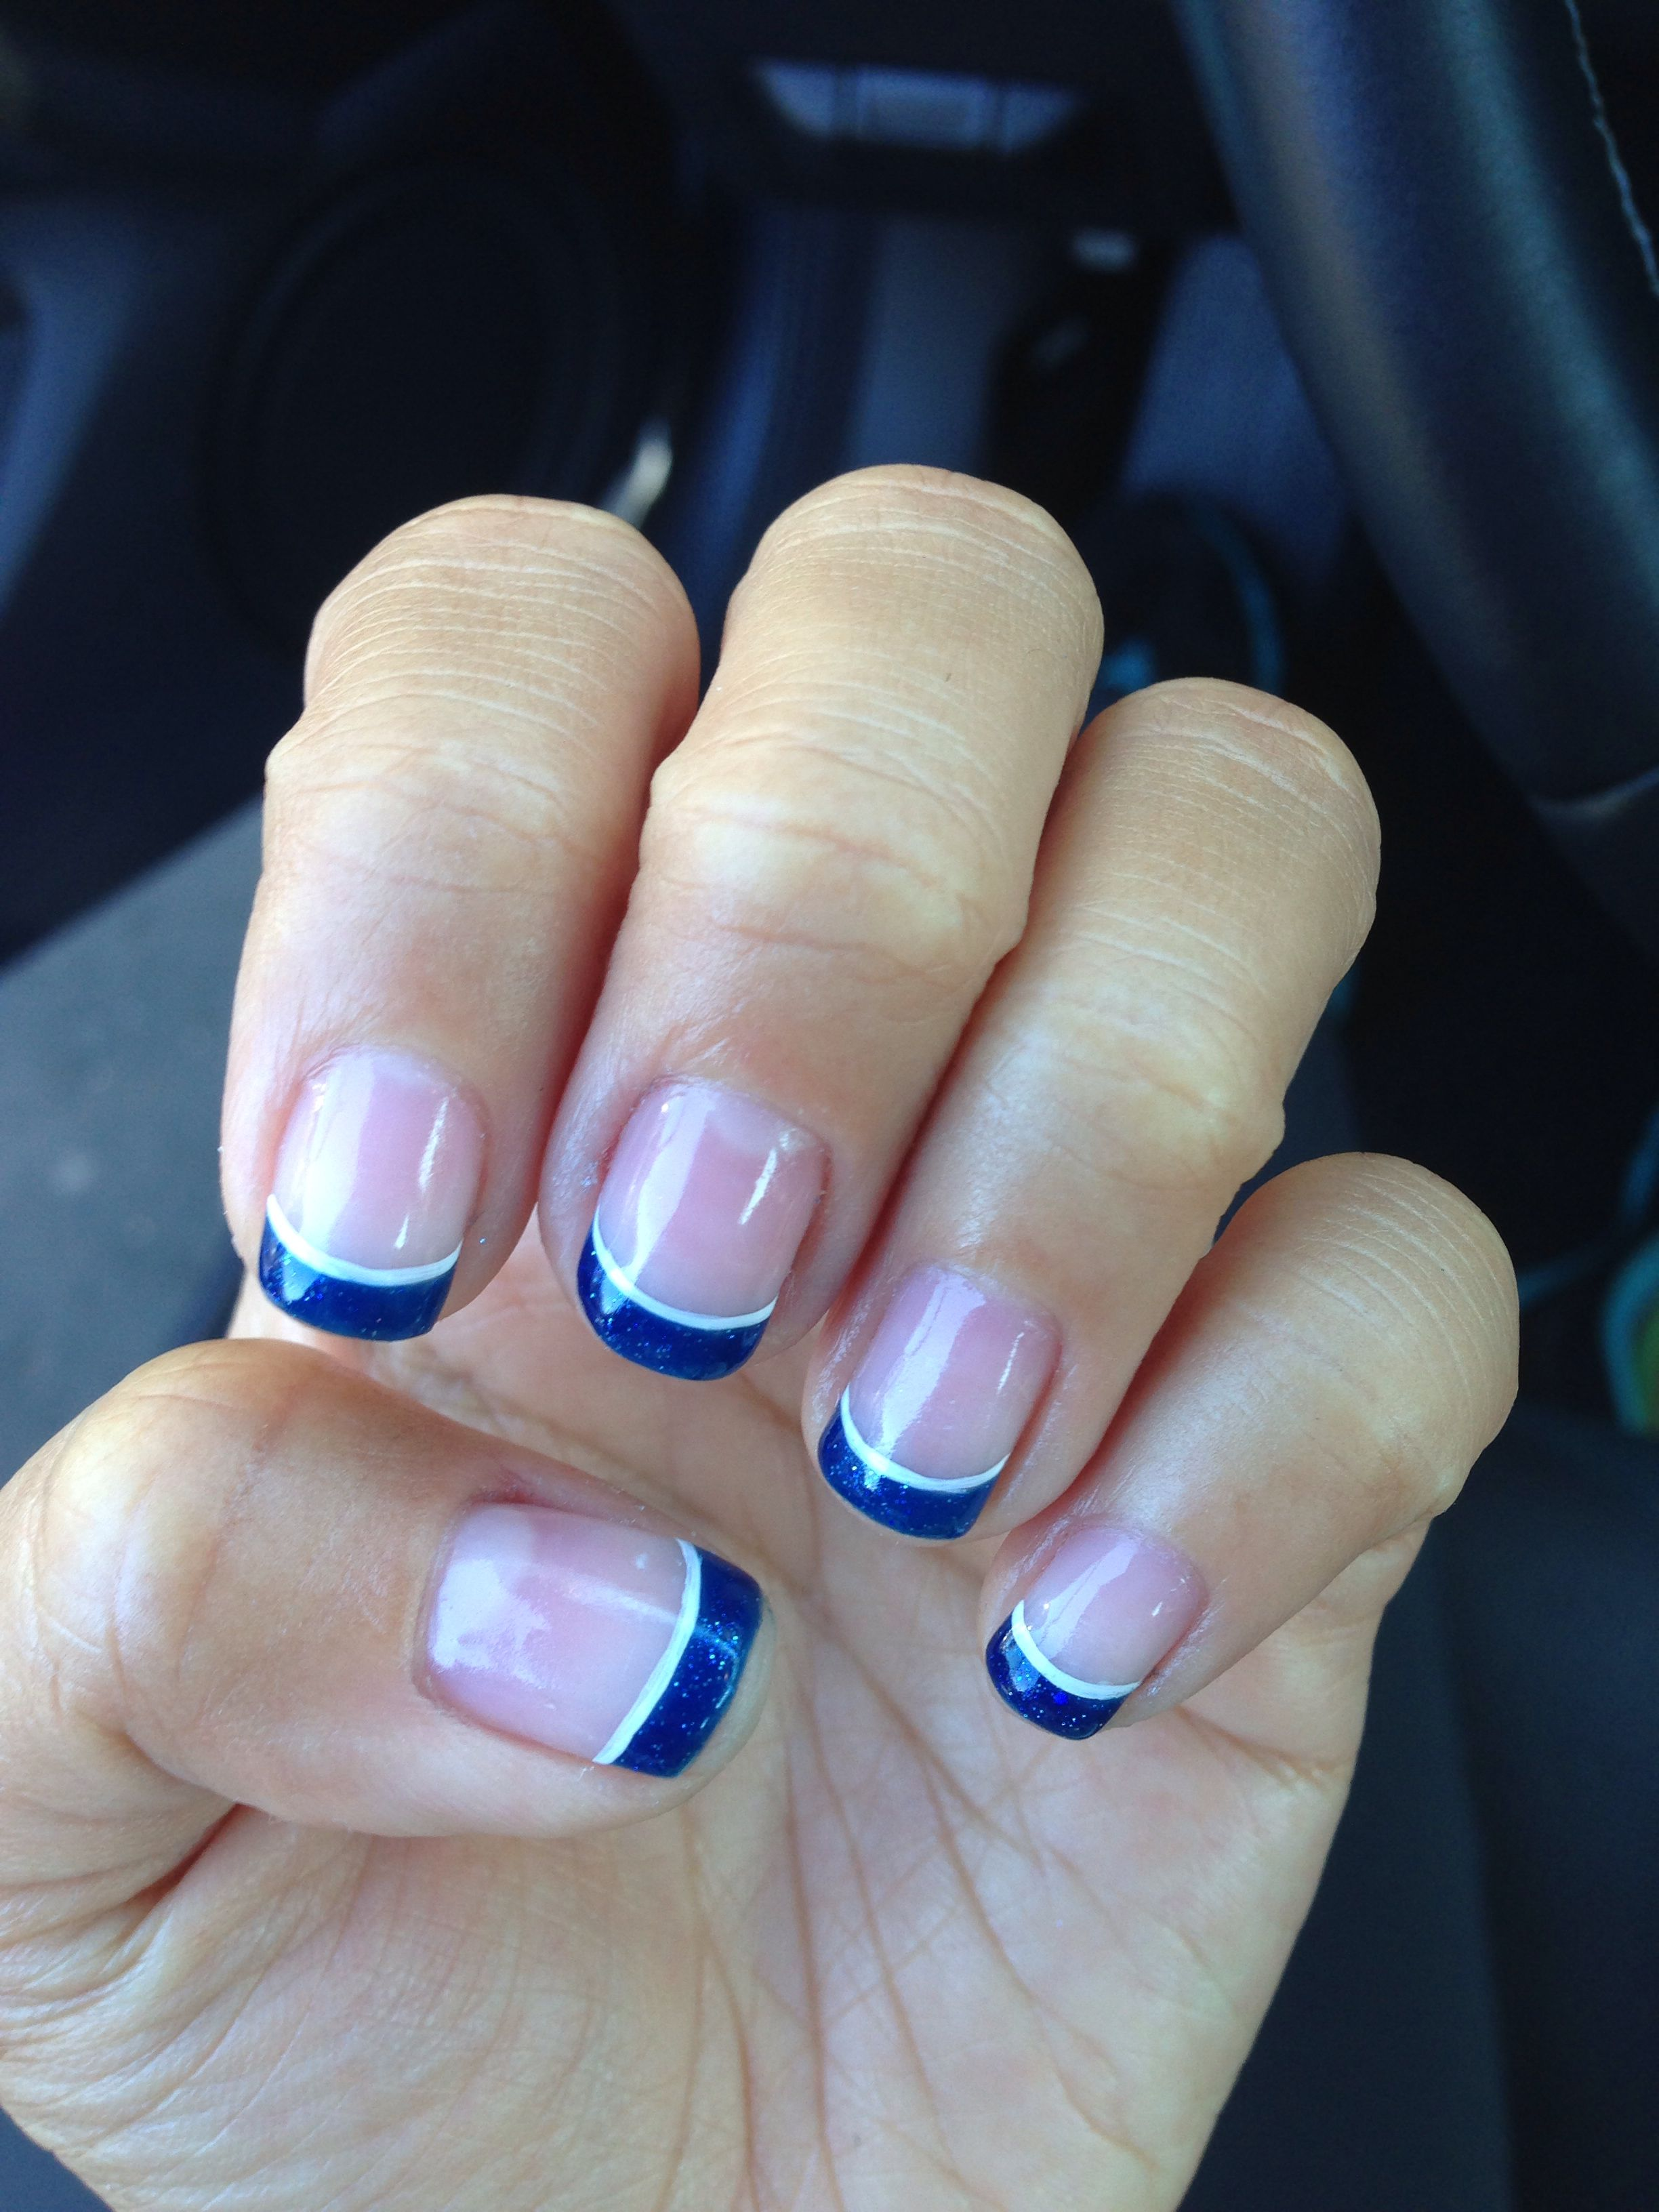 Glittery blue french tip gel nails | Mani Pedi | Pinterest | Mani ...